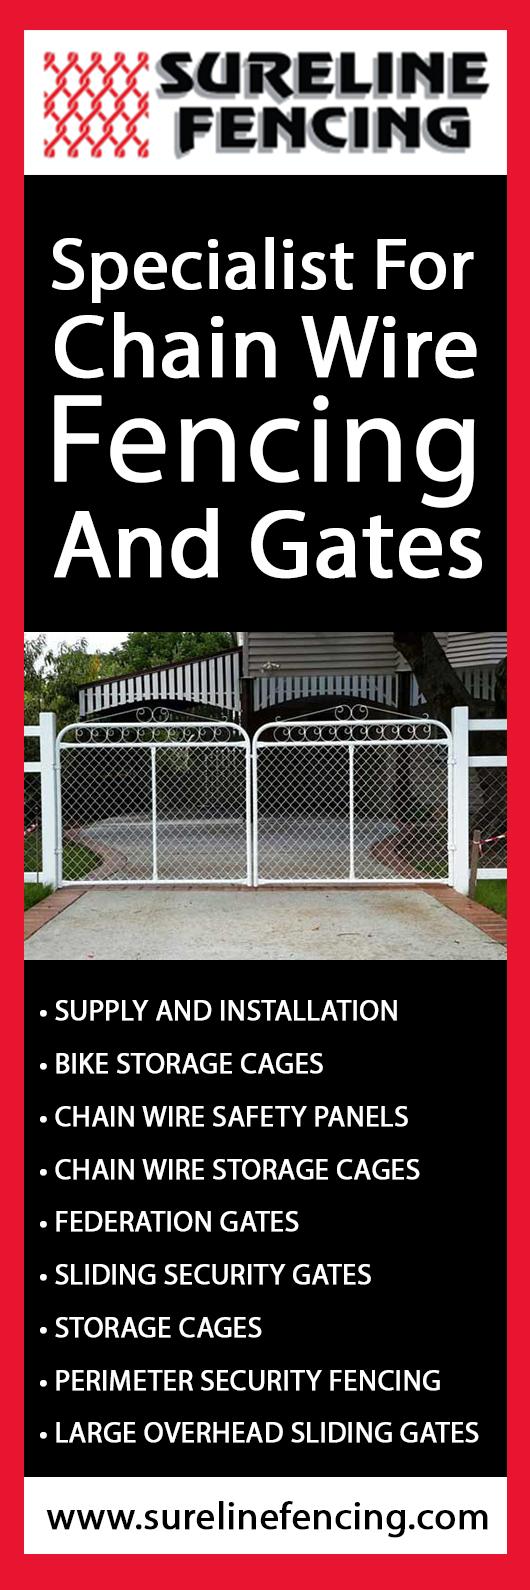 Sureline Fencing - Gates - BRENDALE